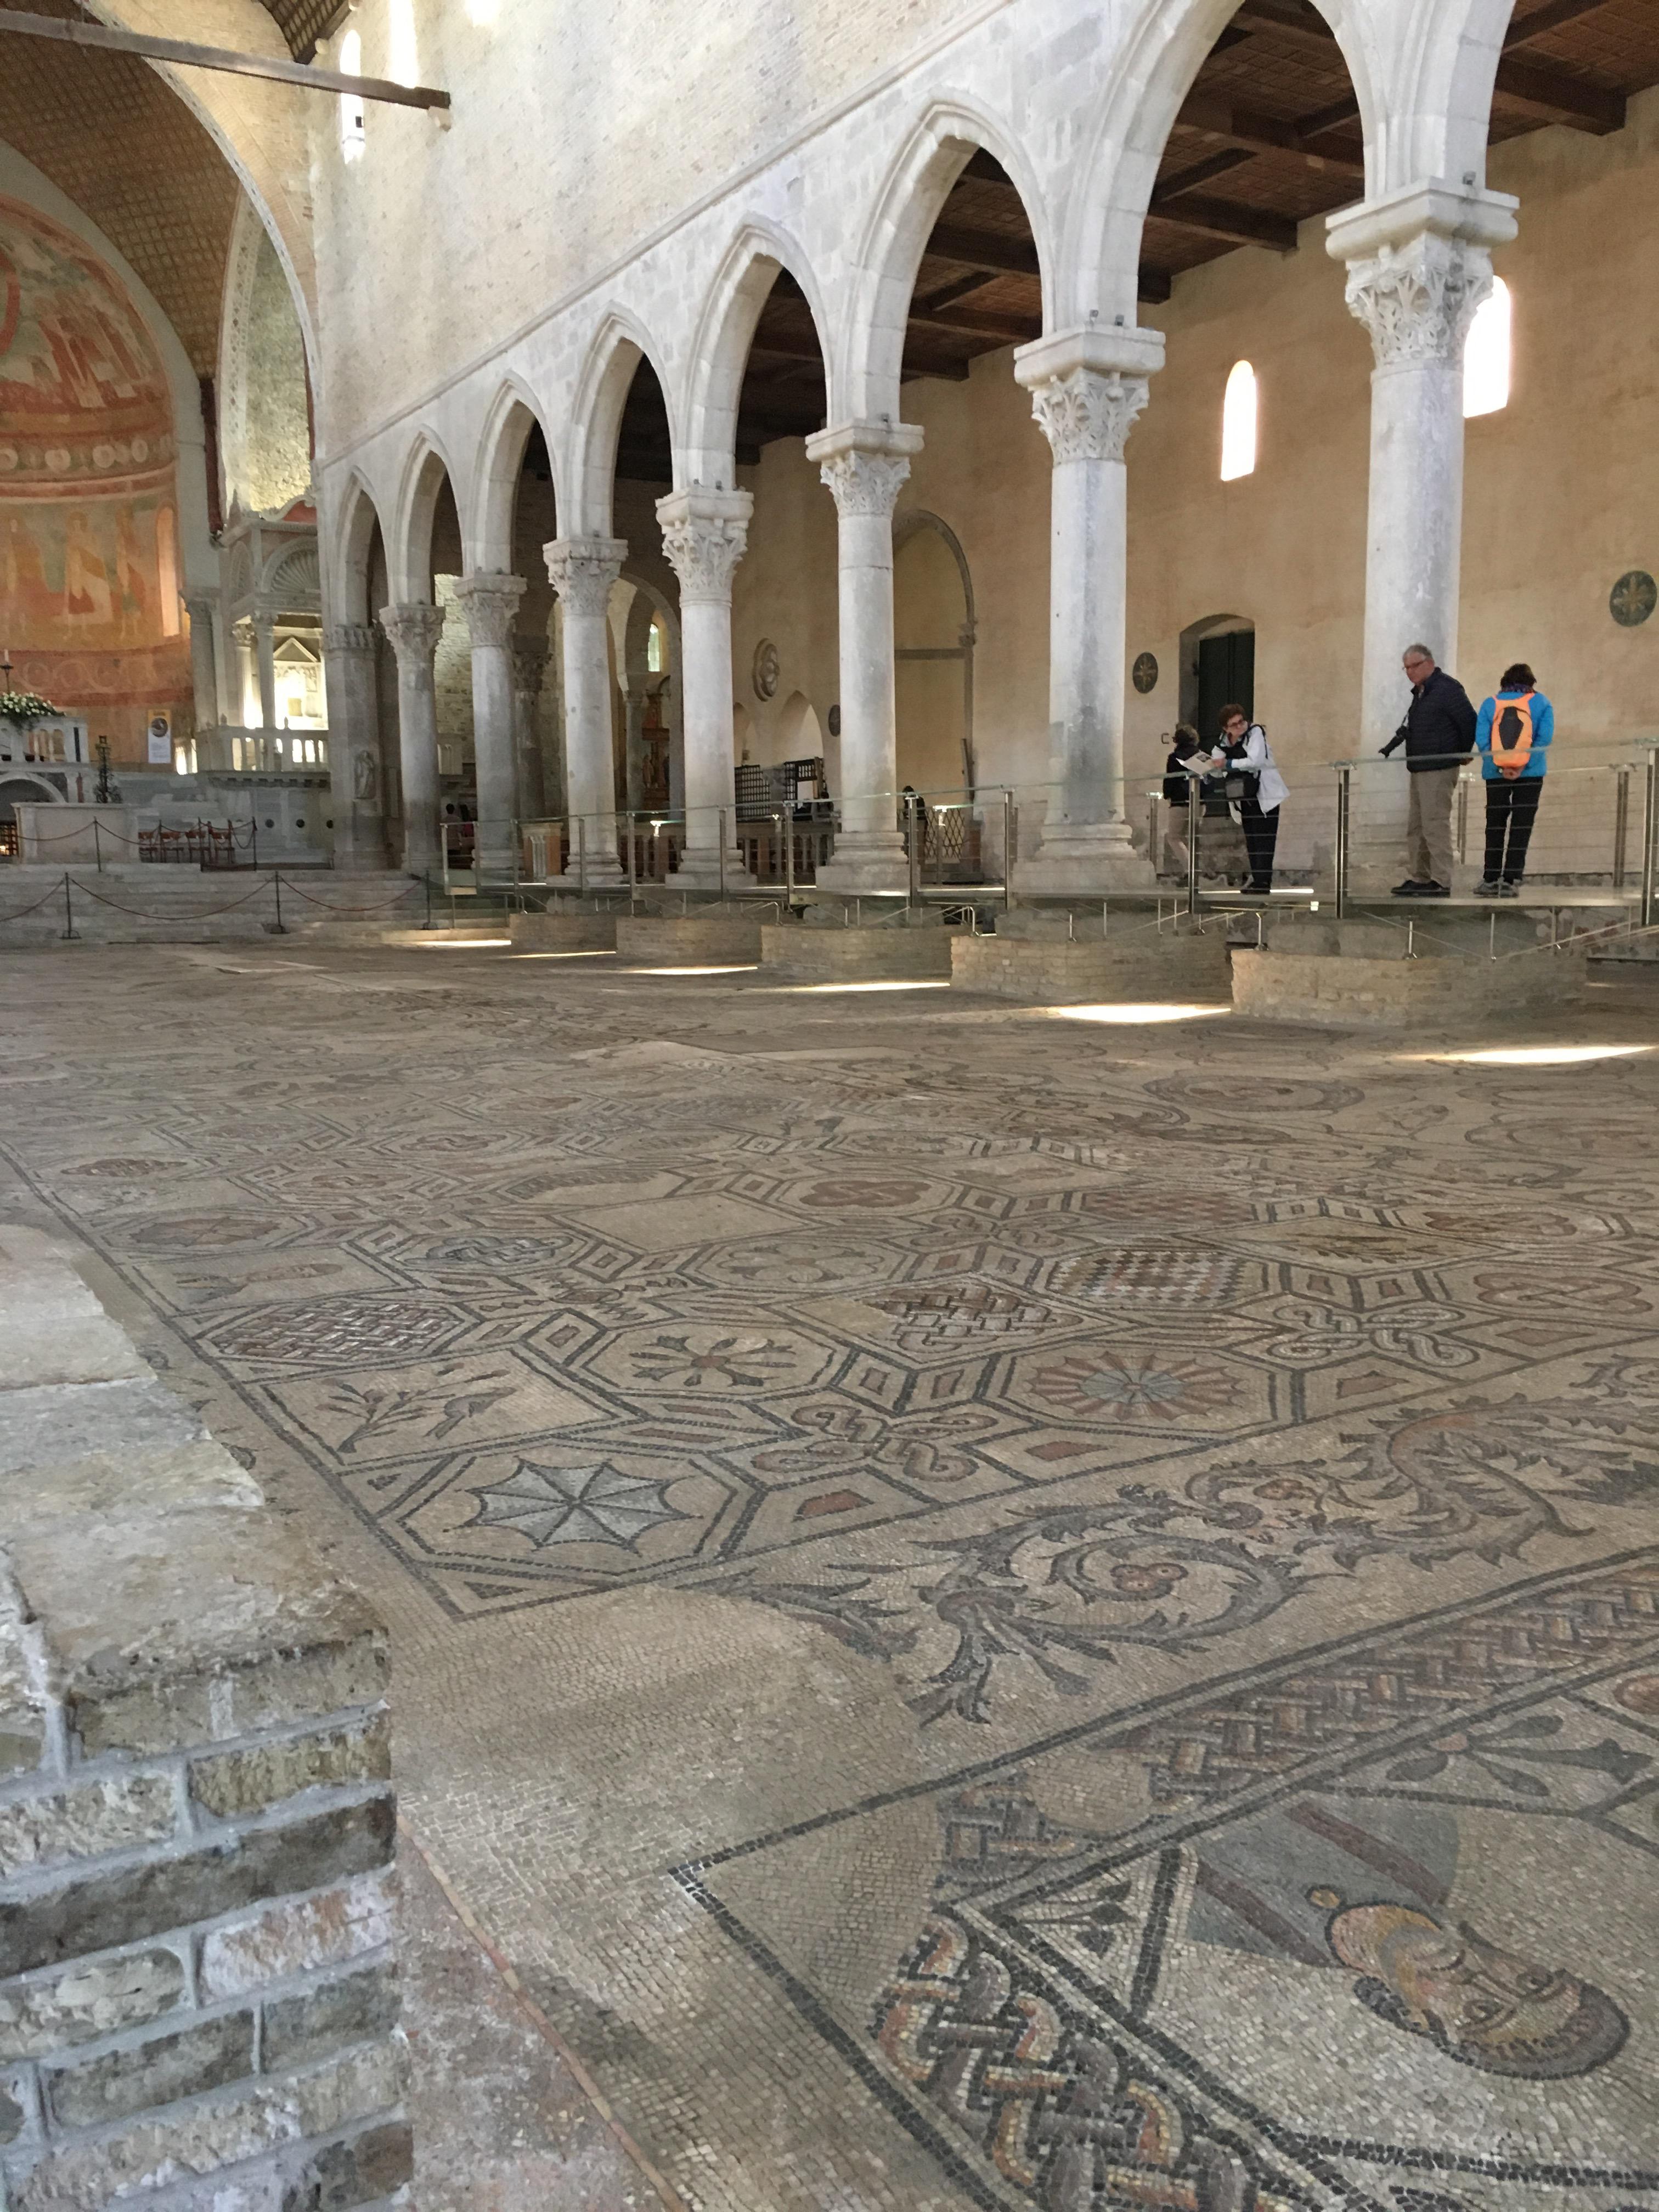 Aquileia - The Roman mosaic flooring under the basilica is vast and so impressive